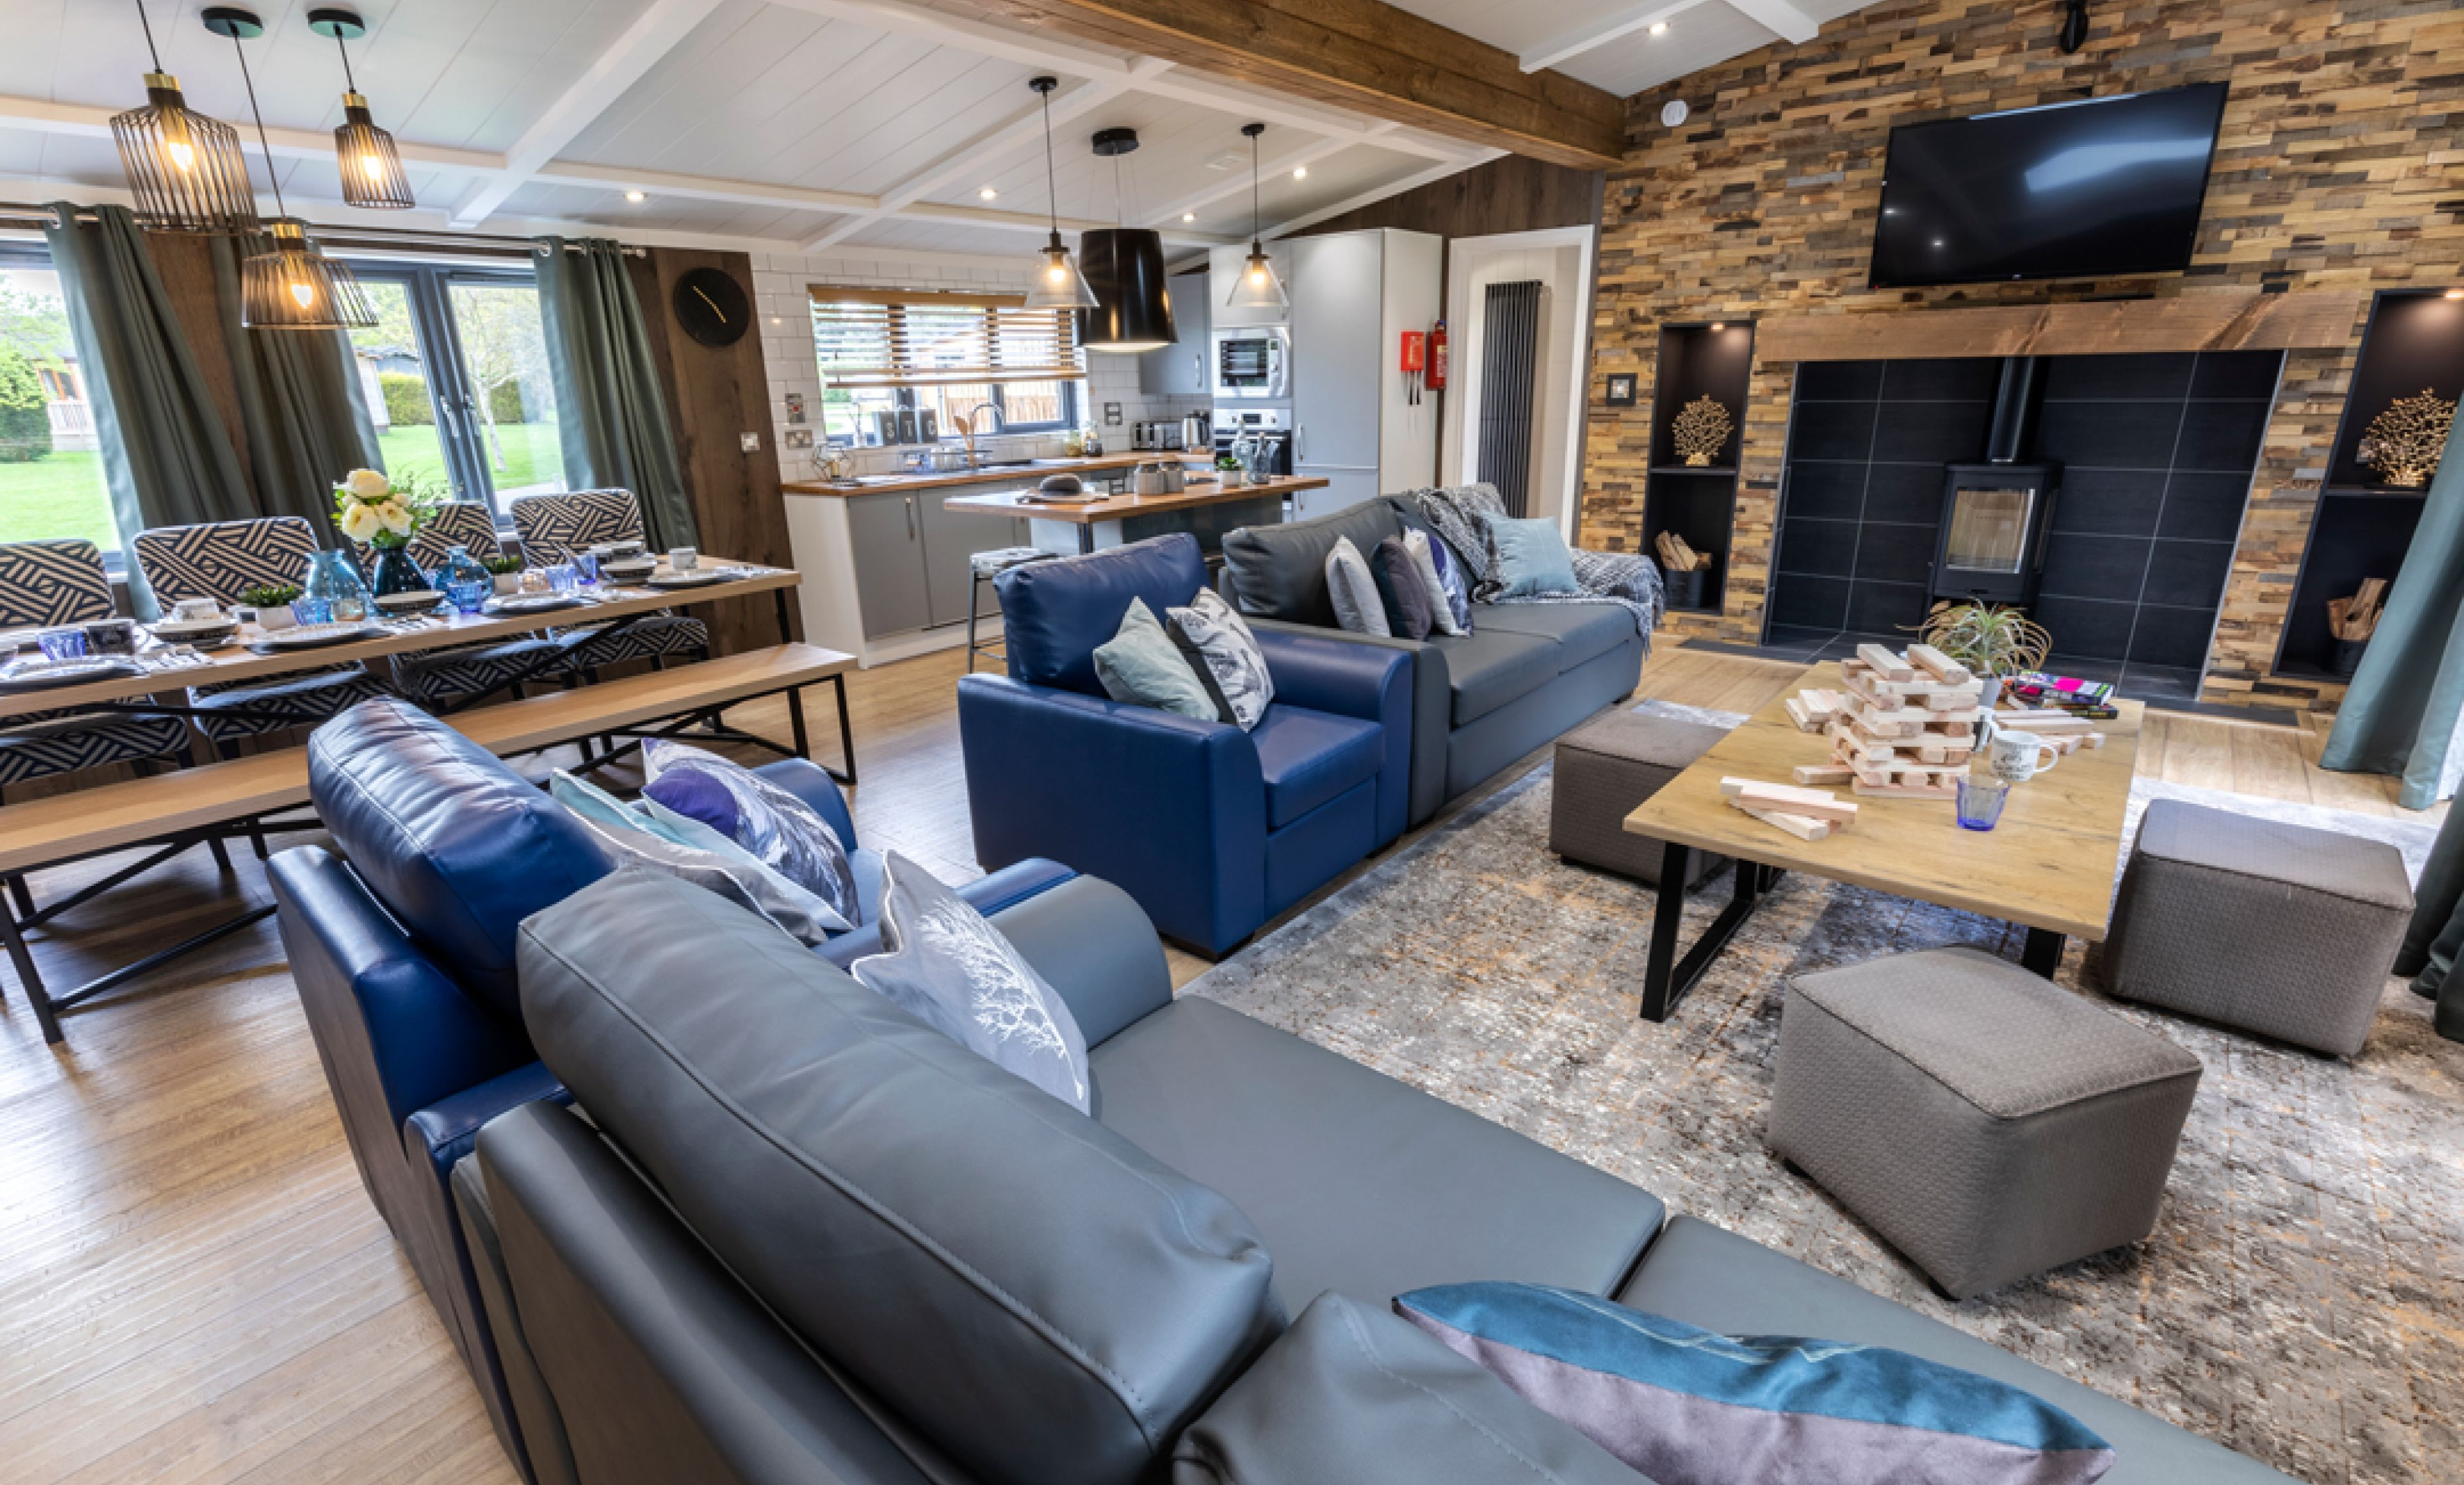 The Sherwood Lounge